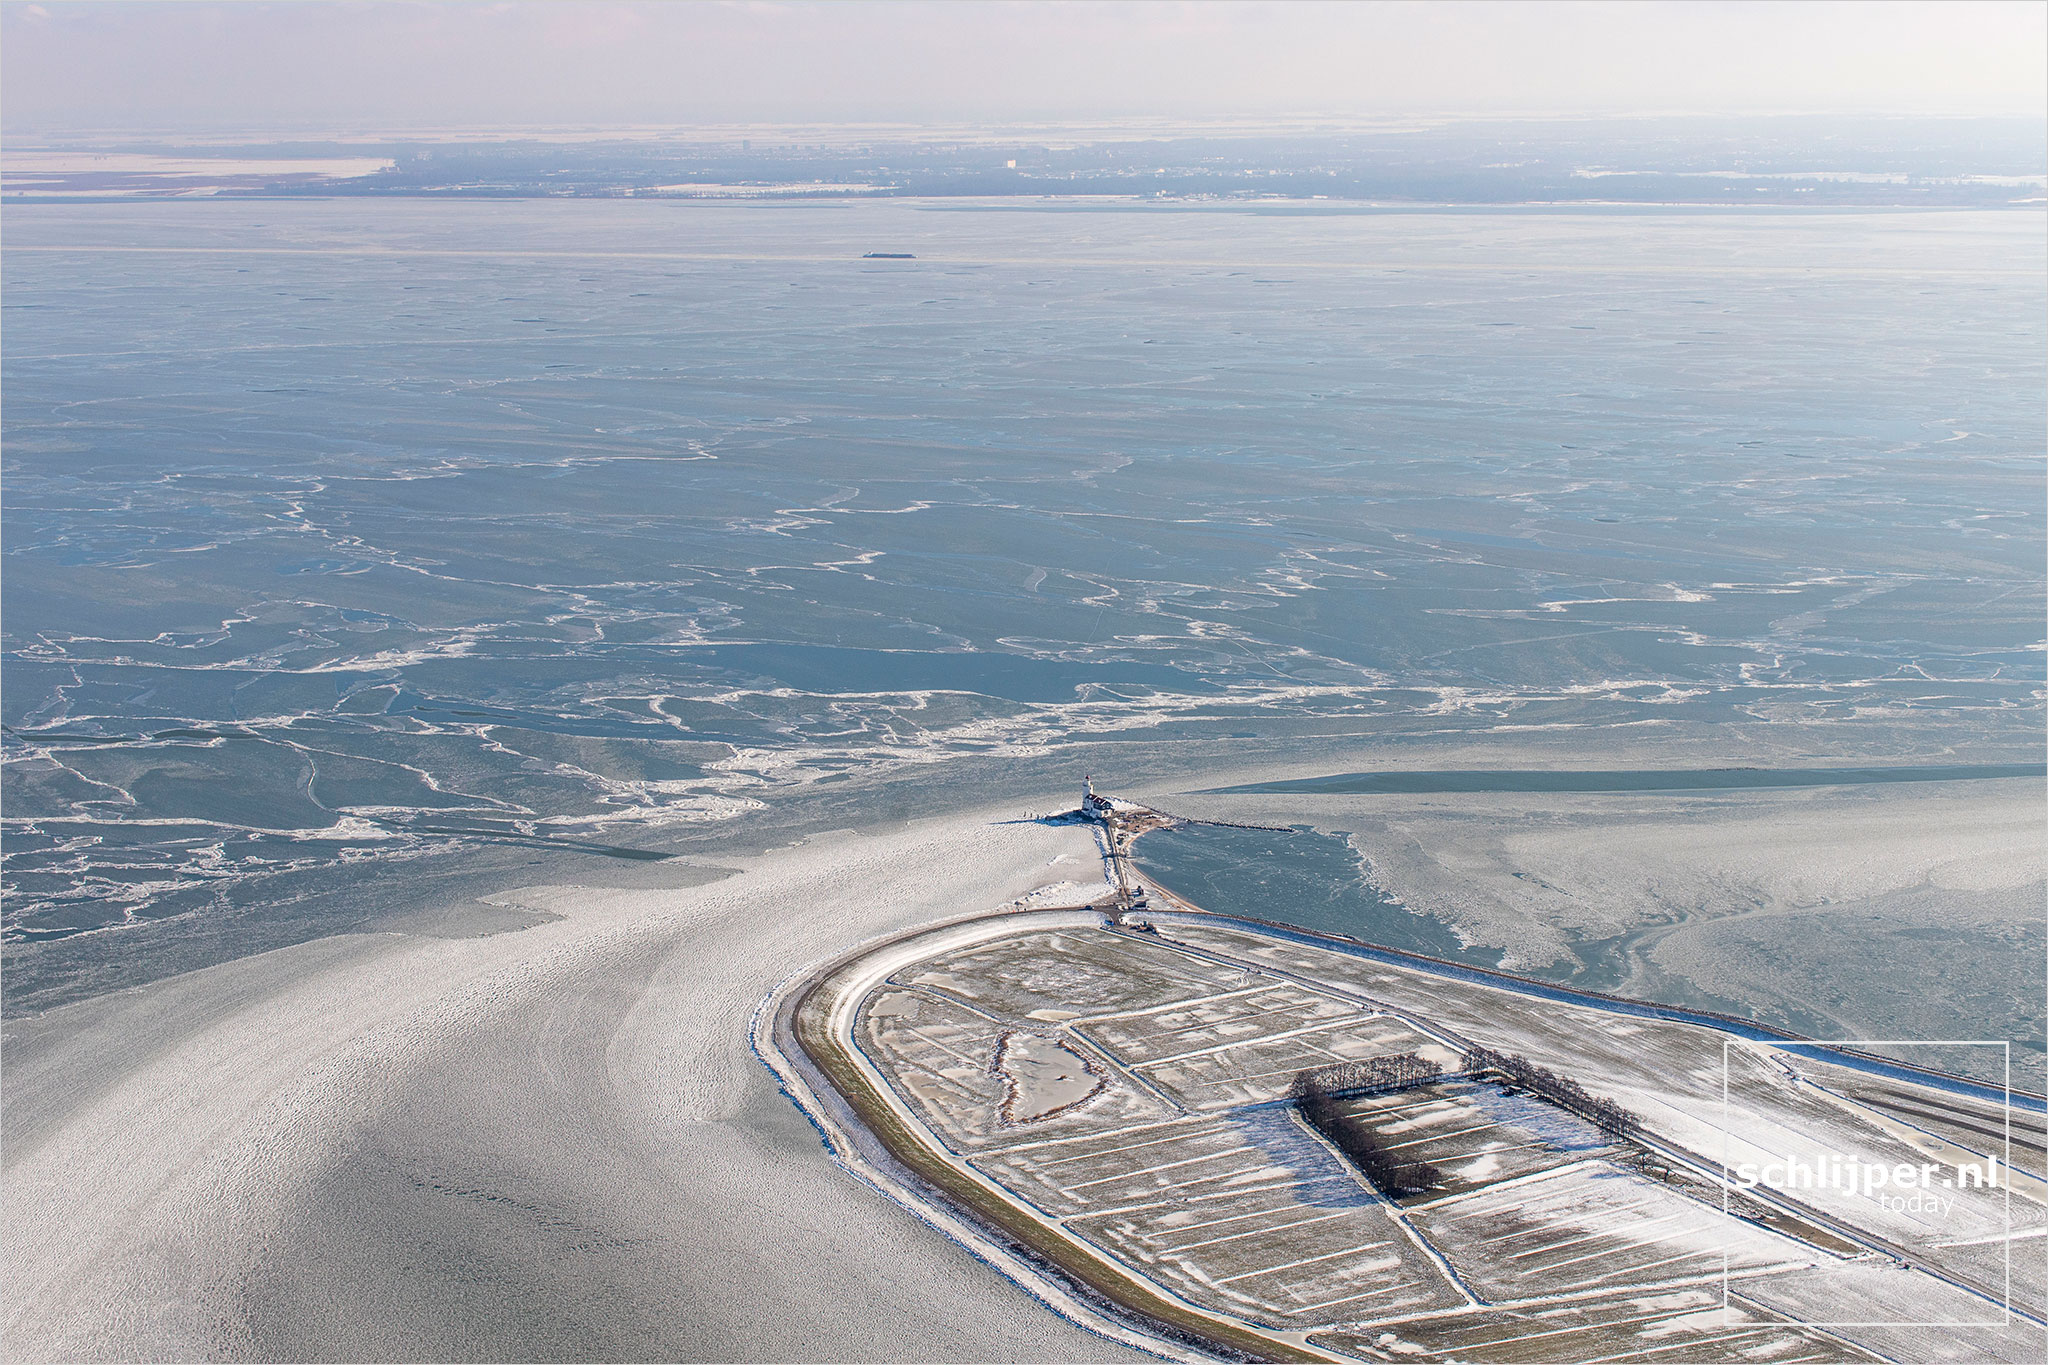 The Netherlands, Marken, 12 februari 2021